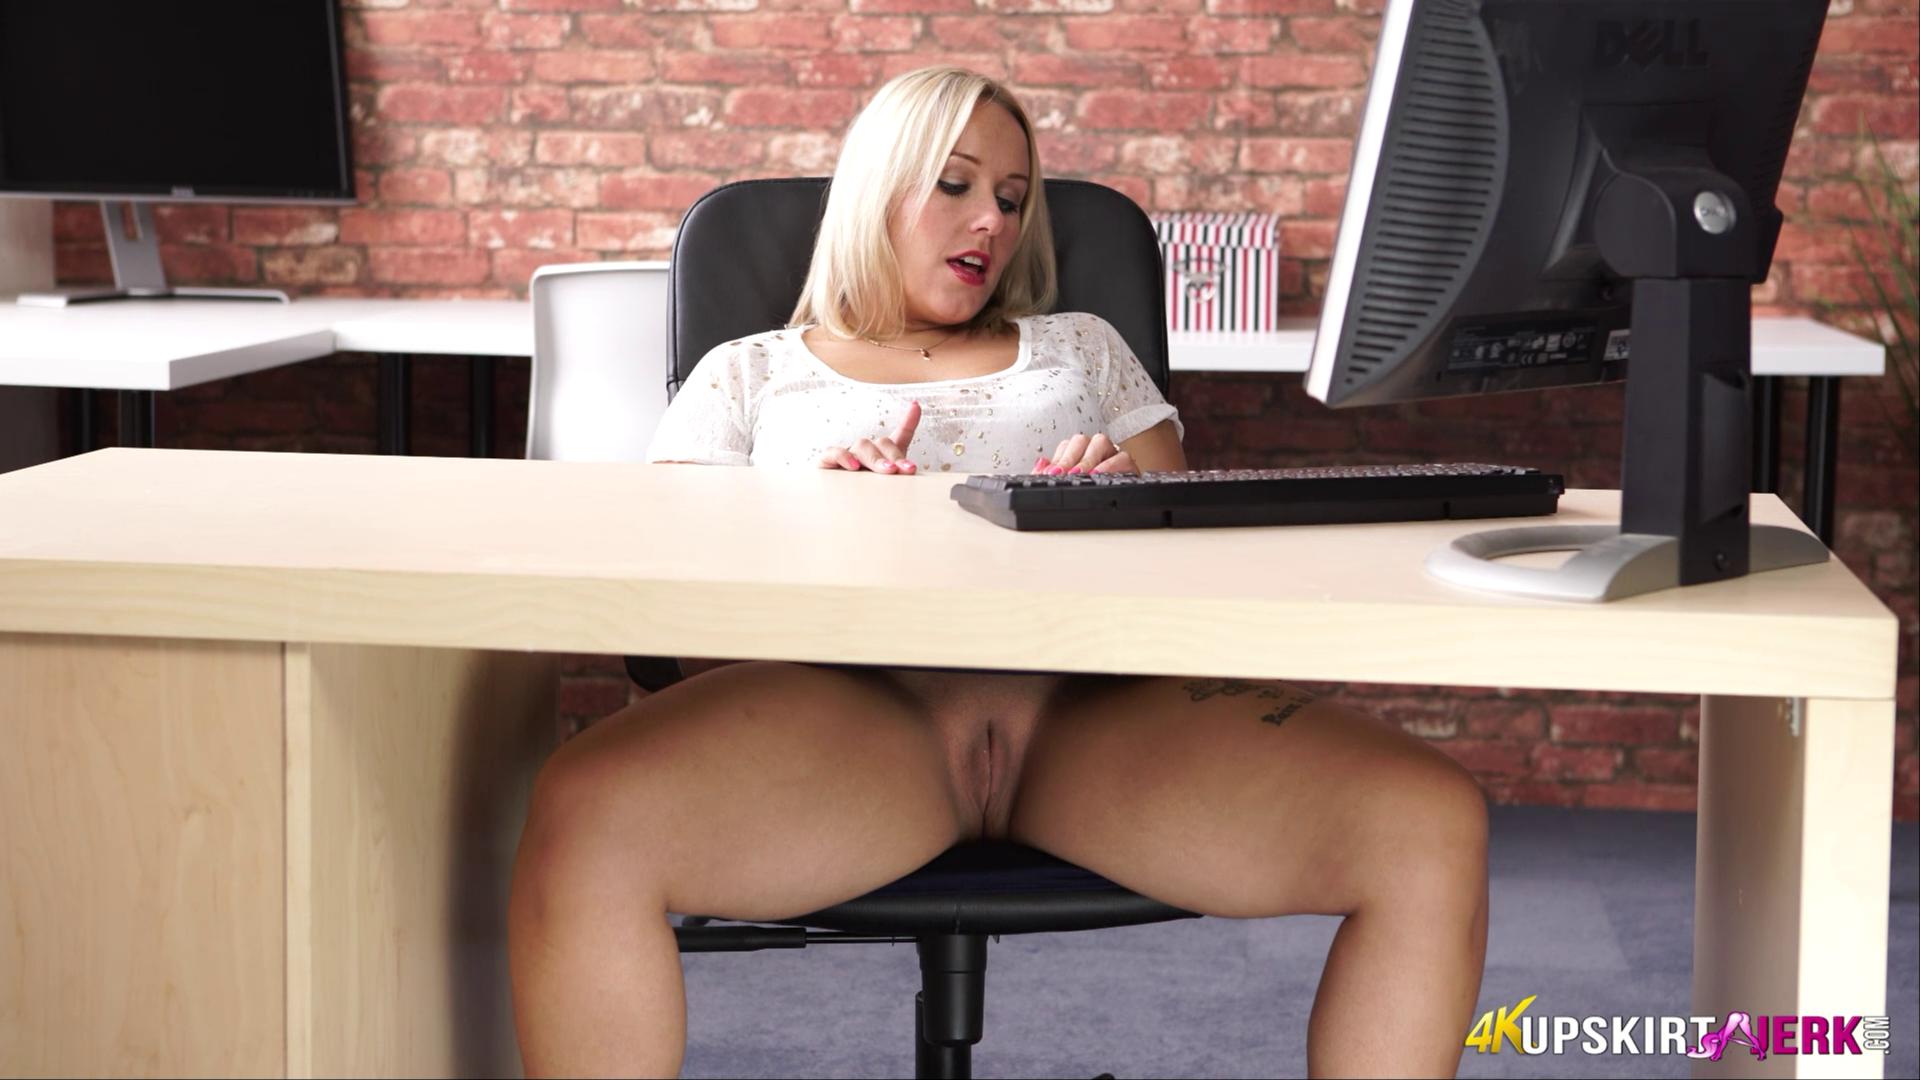 Upskirt porn pictures, free up skirt xxx galleries